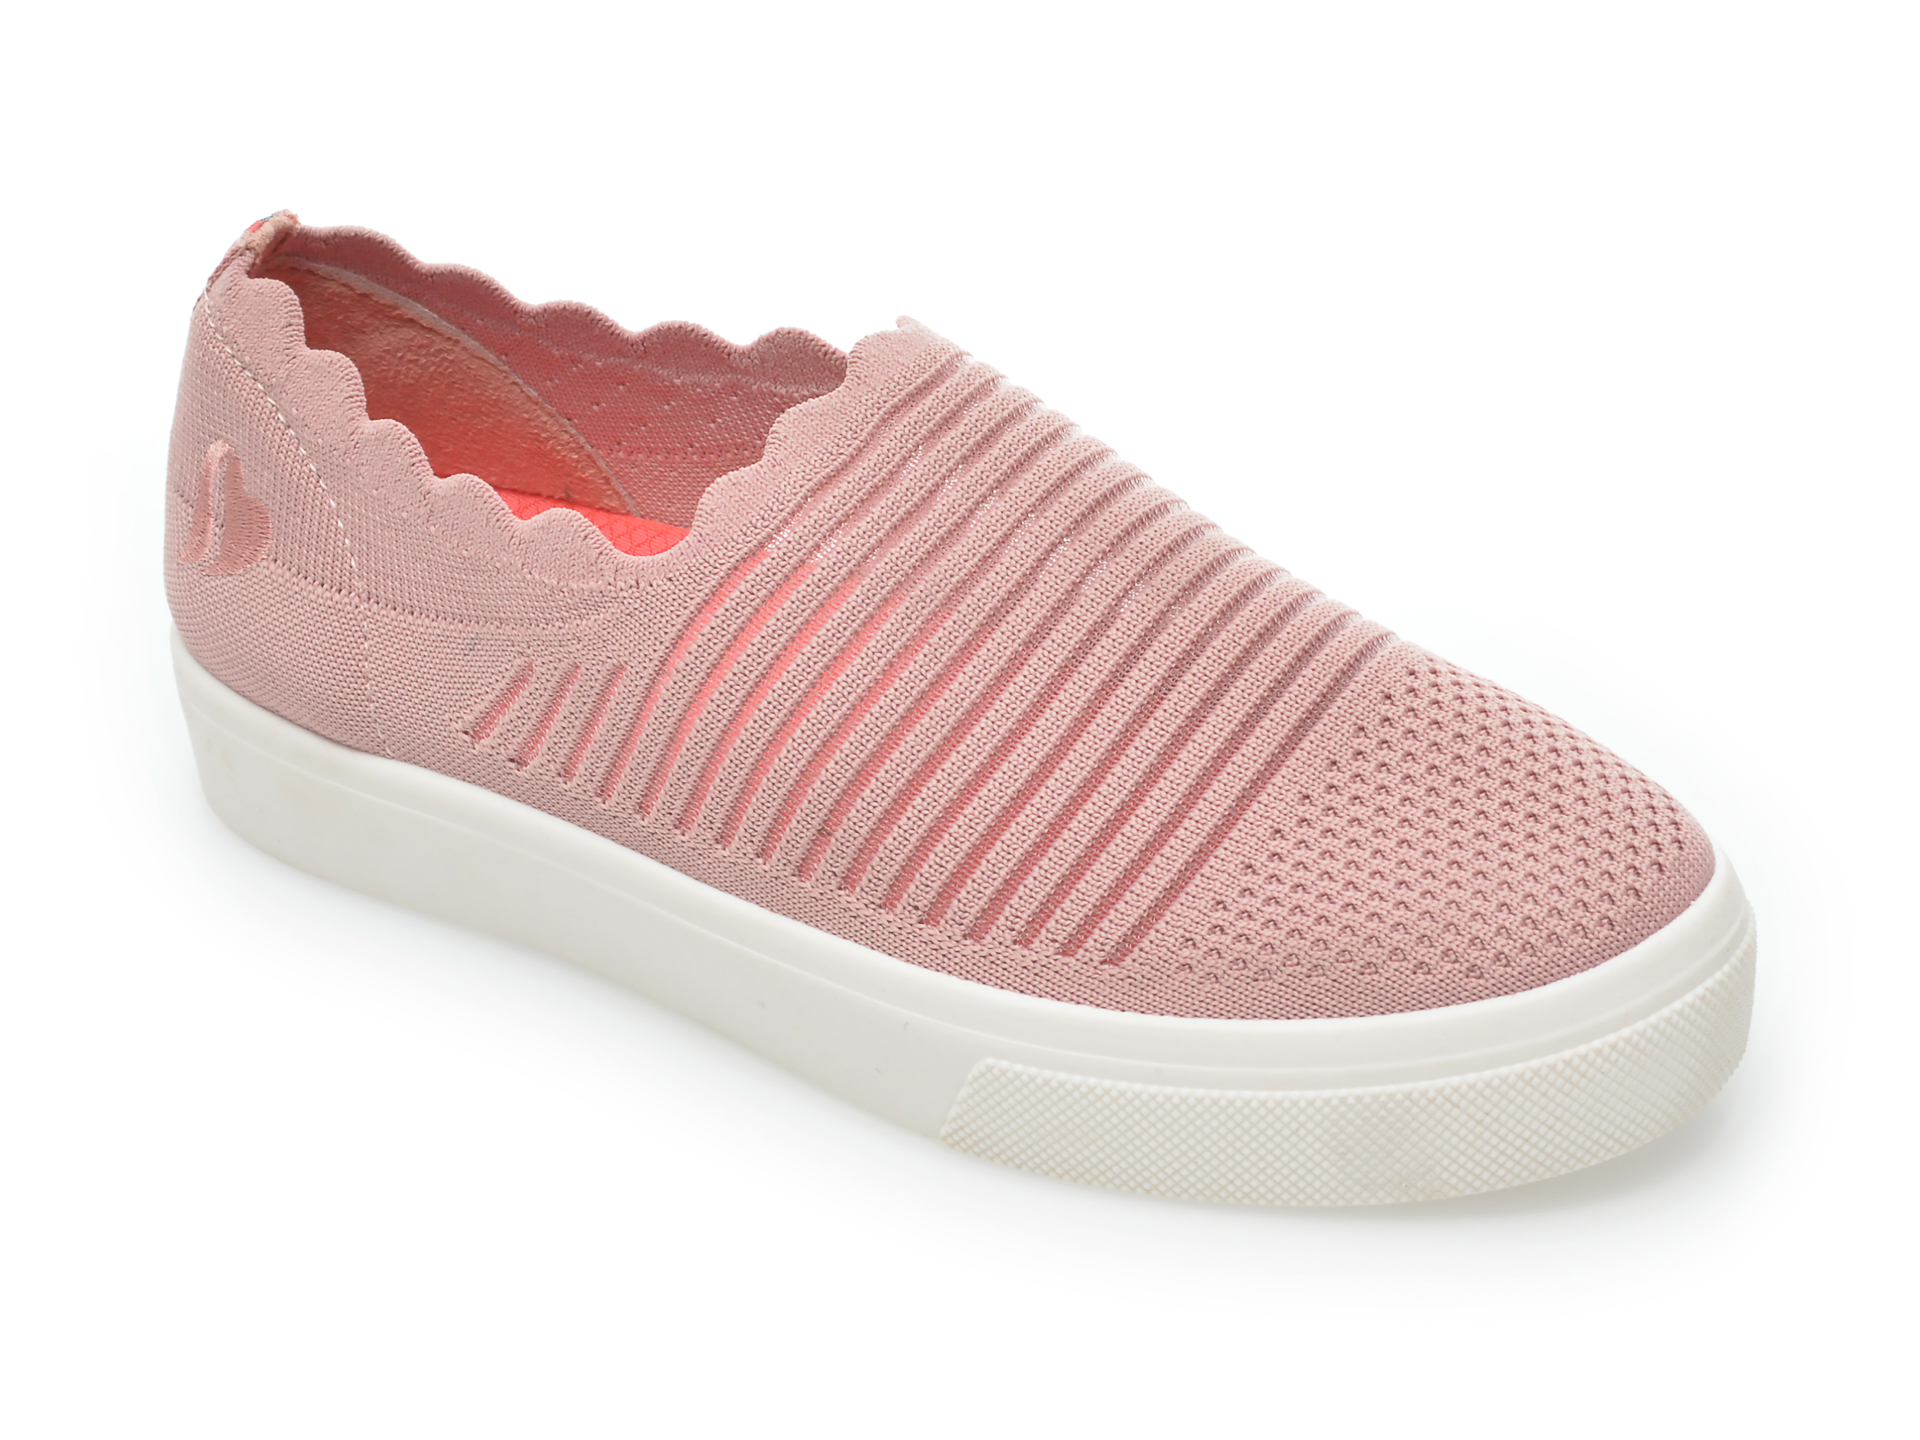 Pantofi sport SKECHERS roz, Poppy Breezy Street, din material textil New